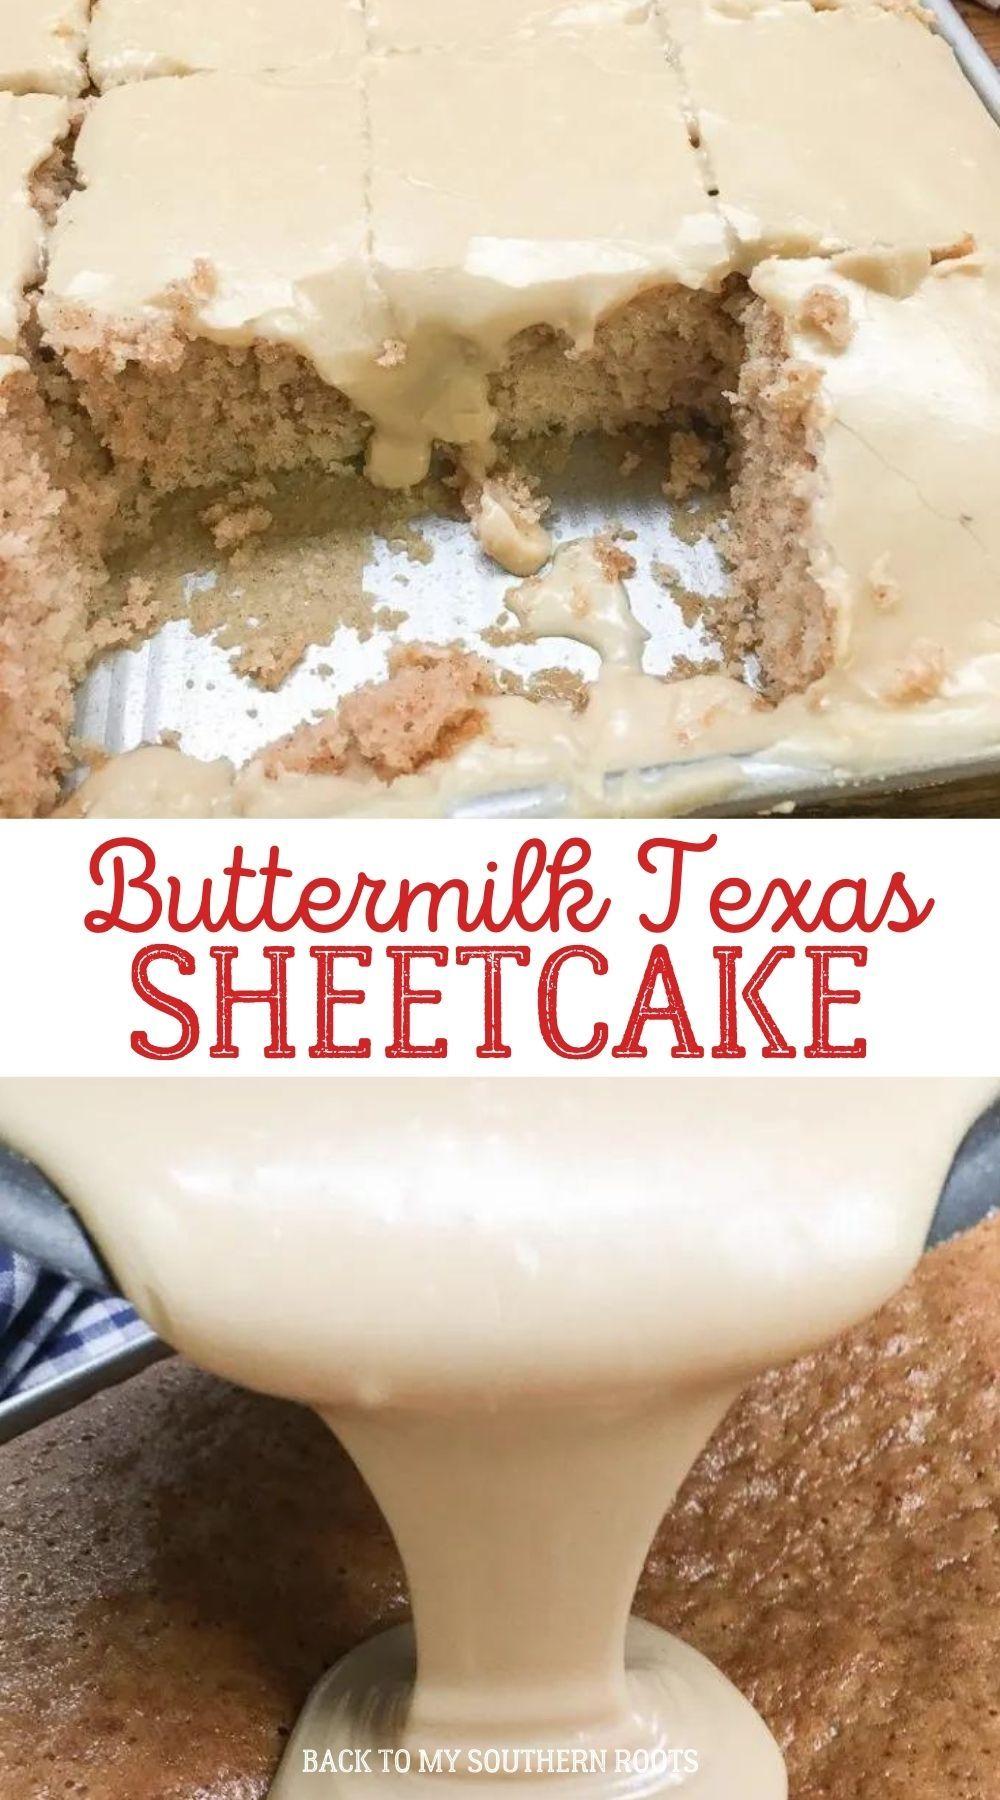 Buttermilk Texas Sheet Cake Recipe In 2020 Delicious Desserts Texas Sheet Cake Sheet Cake Recipes